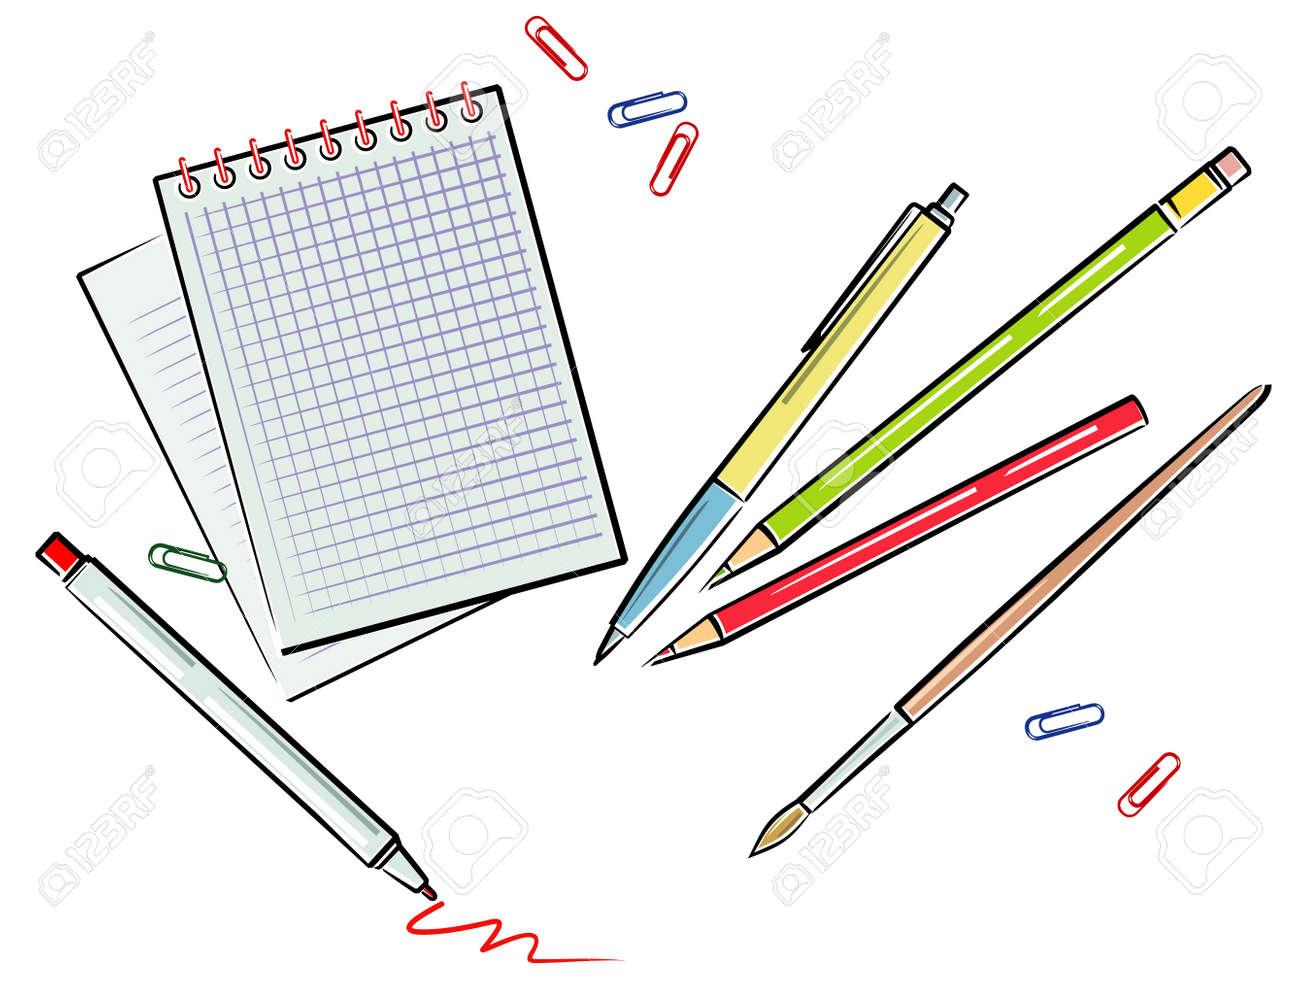 Office supplies illustration (Vector) Stock Vector - 4961624